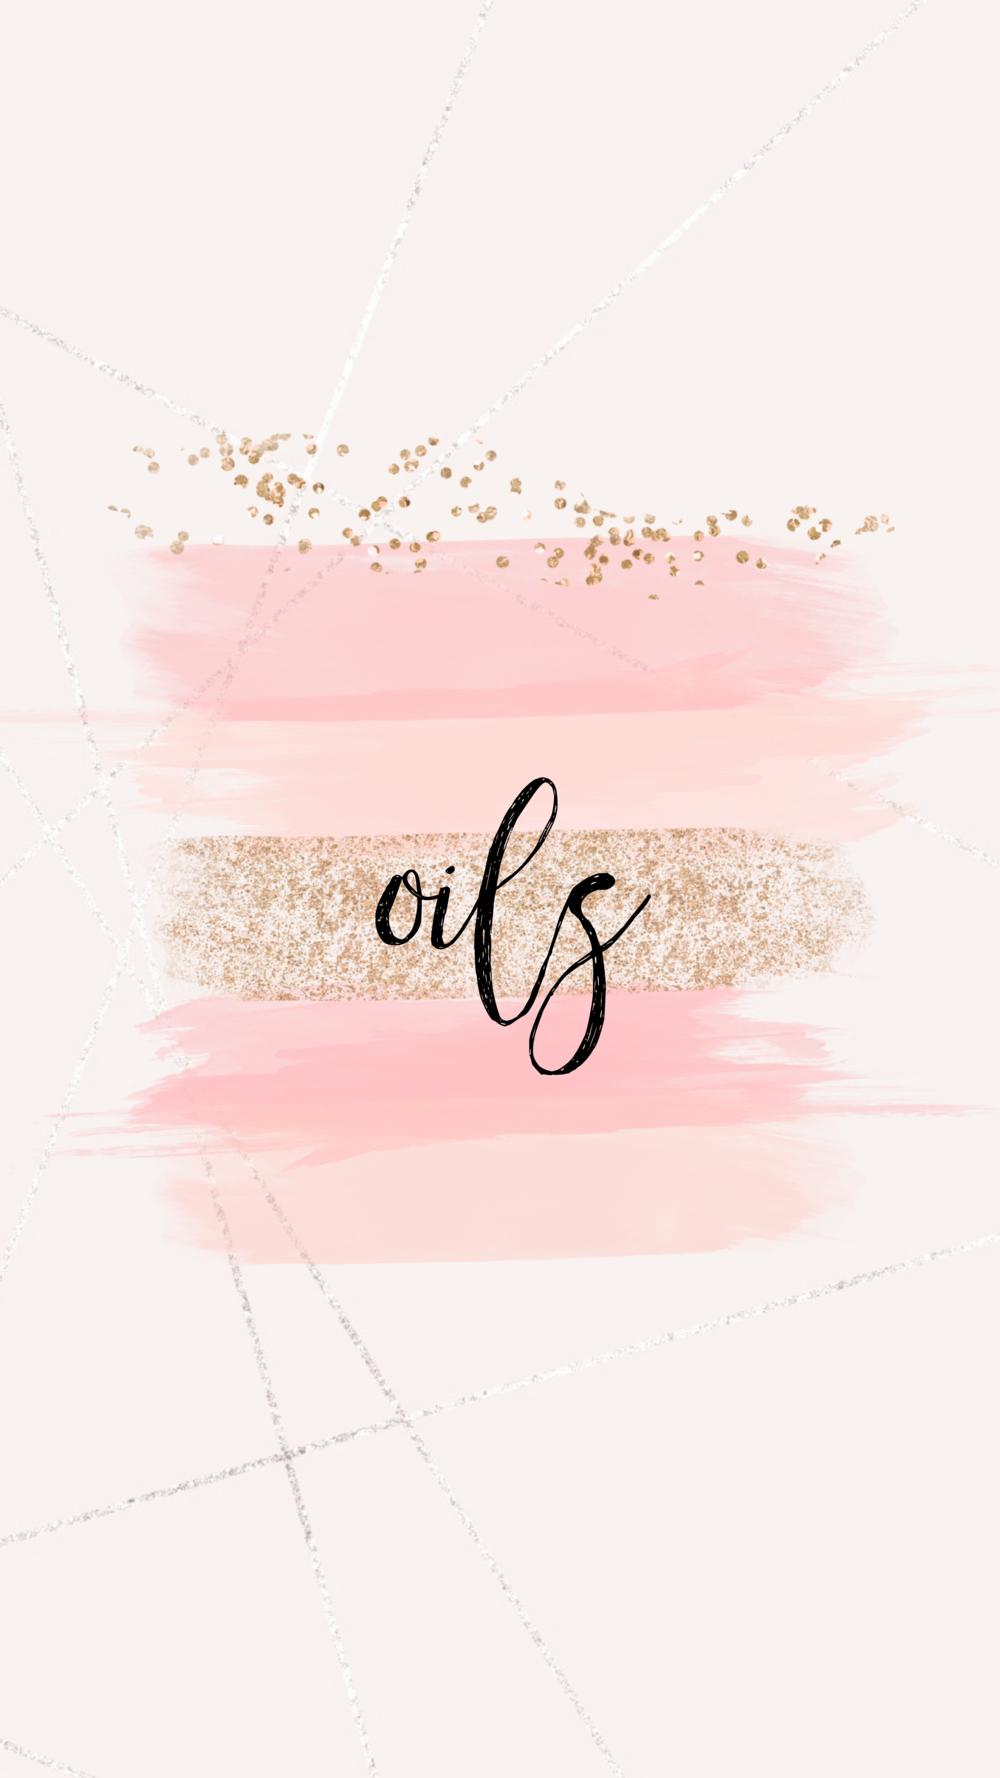 oils.png